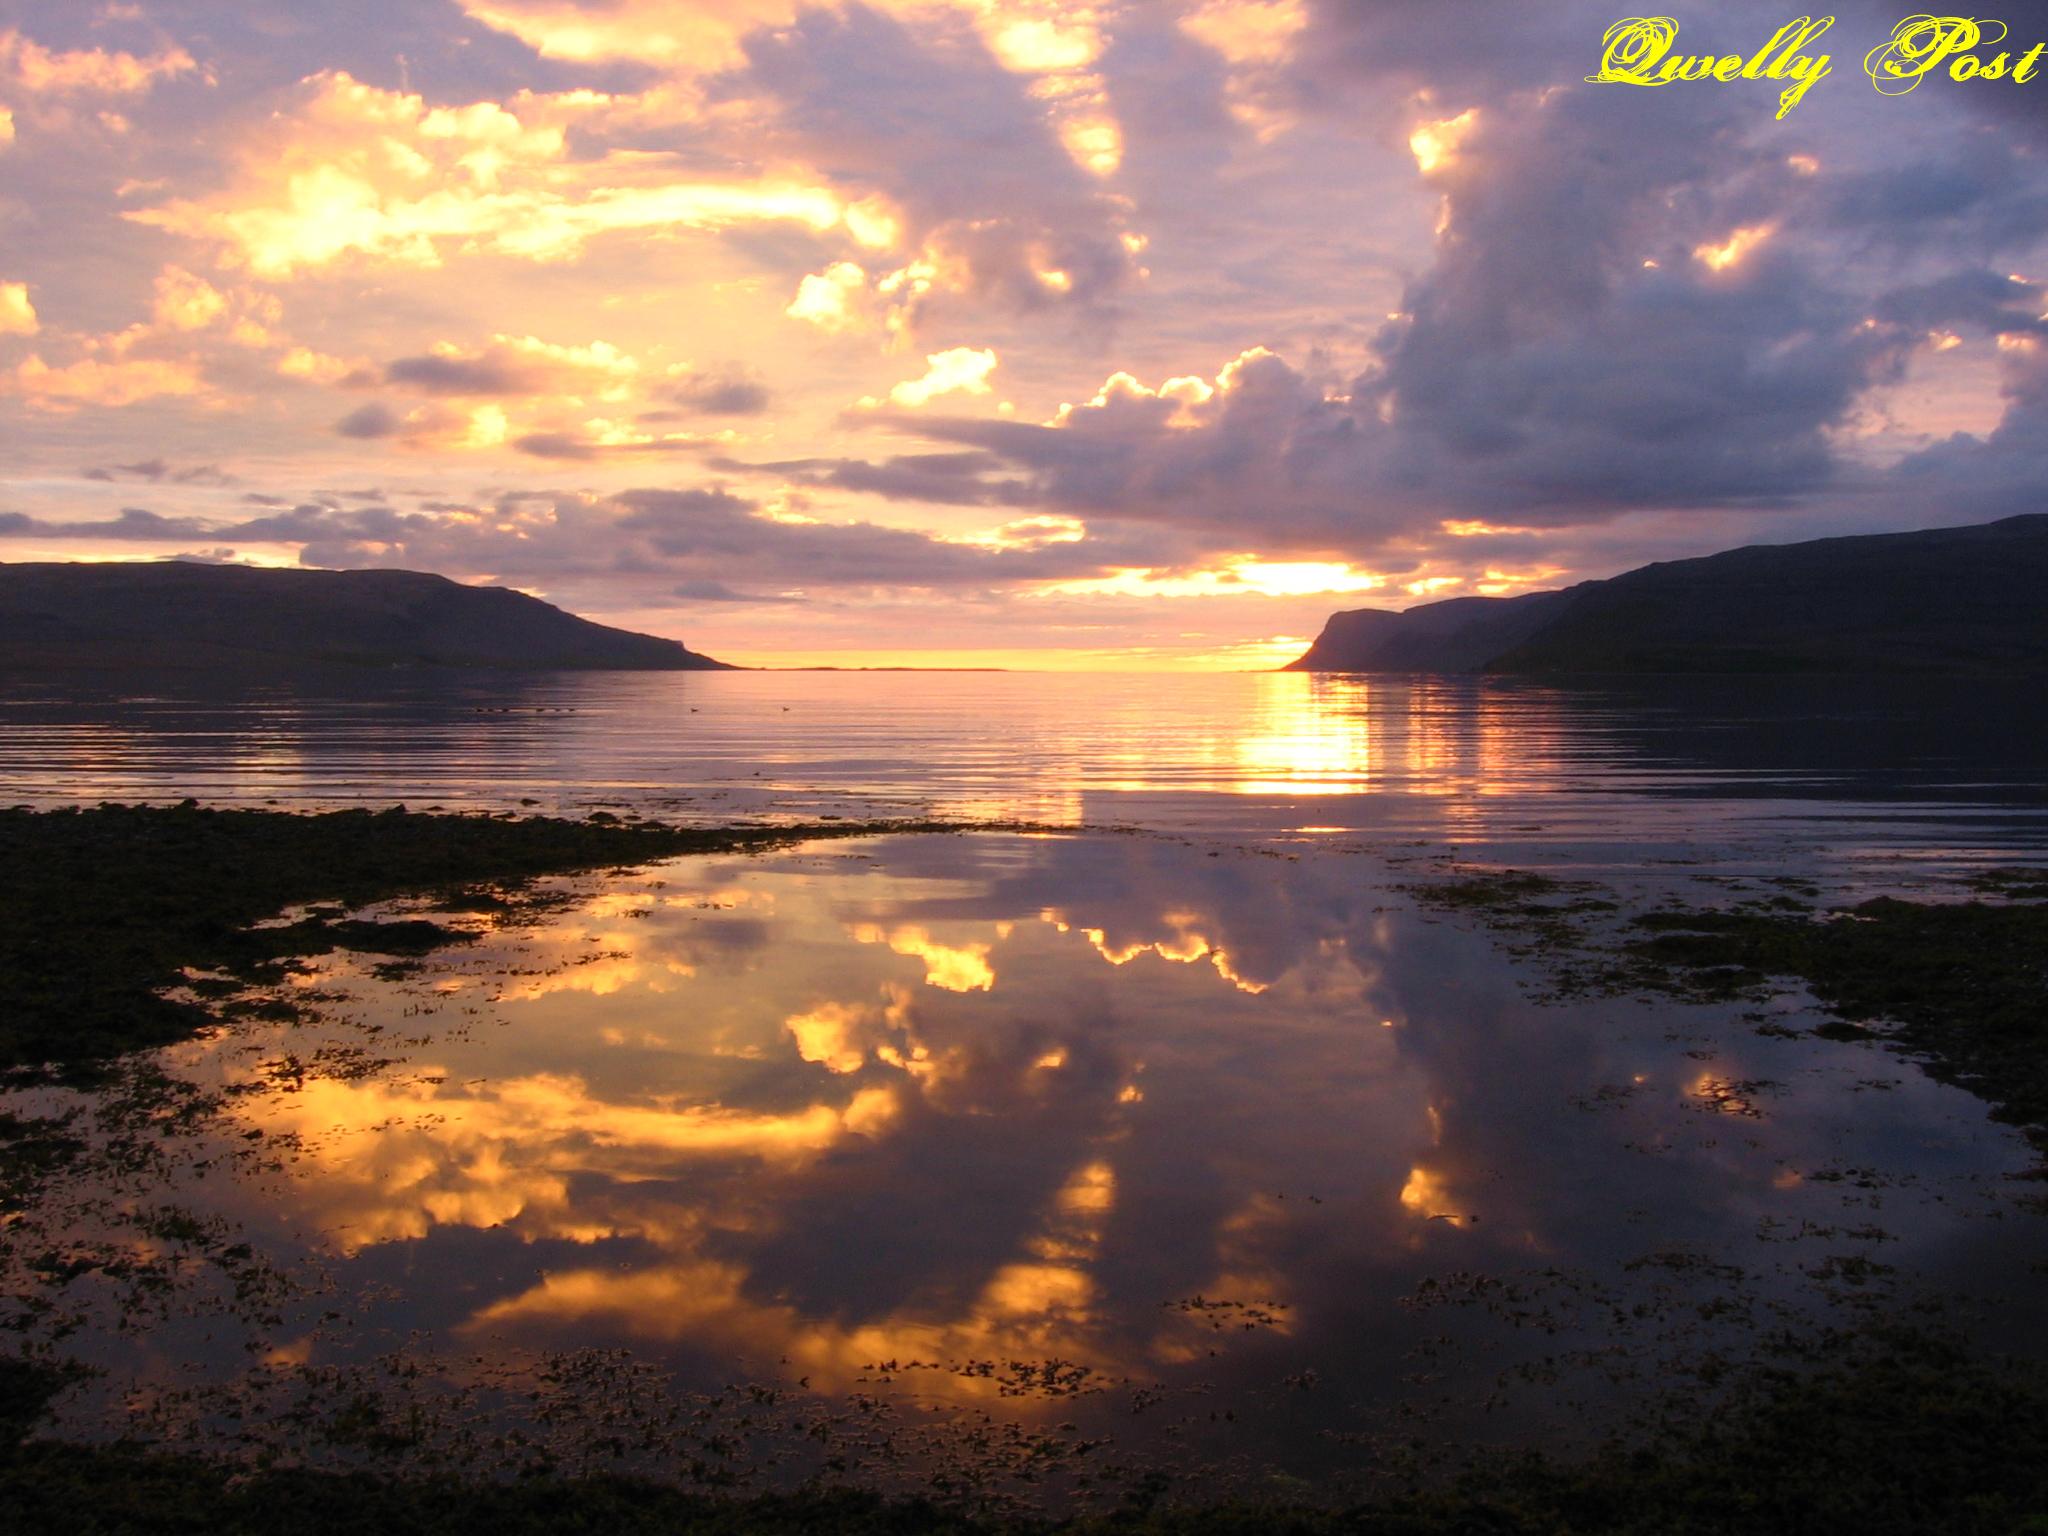 qwelly | post | island | photo | ახალგაზრდა კუნძული | პოსტი | ბლოგი